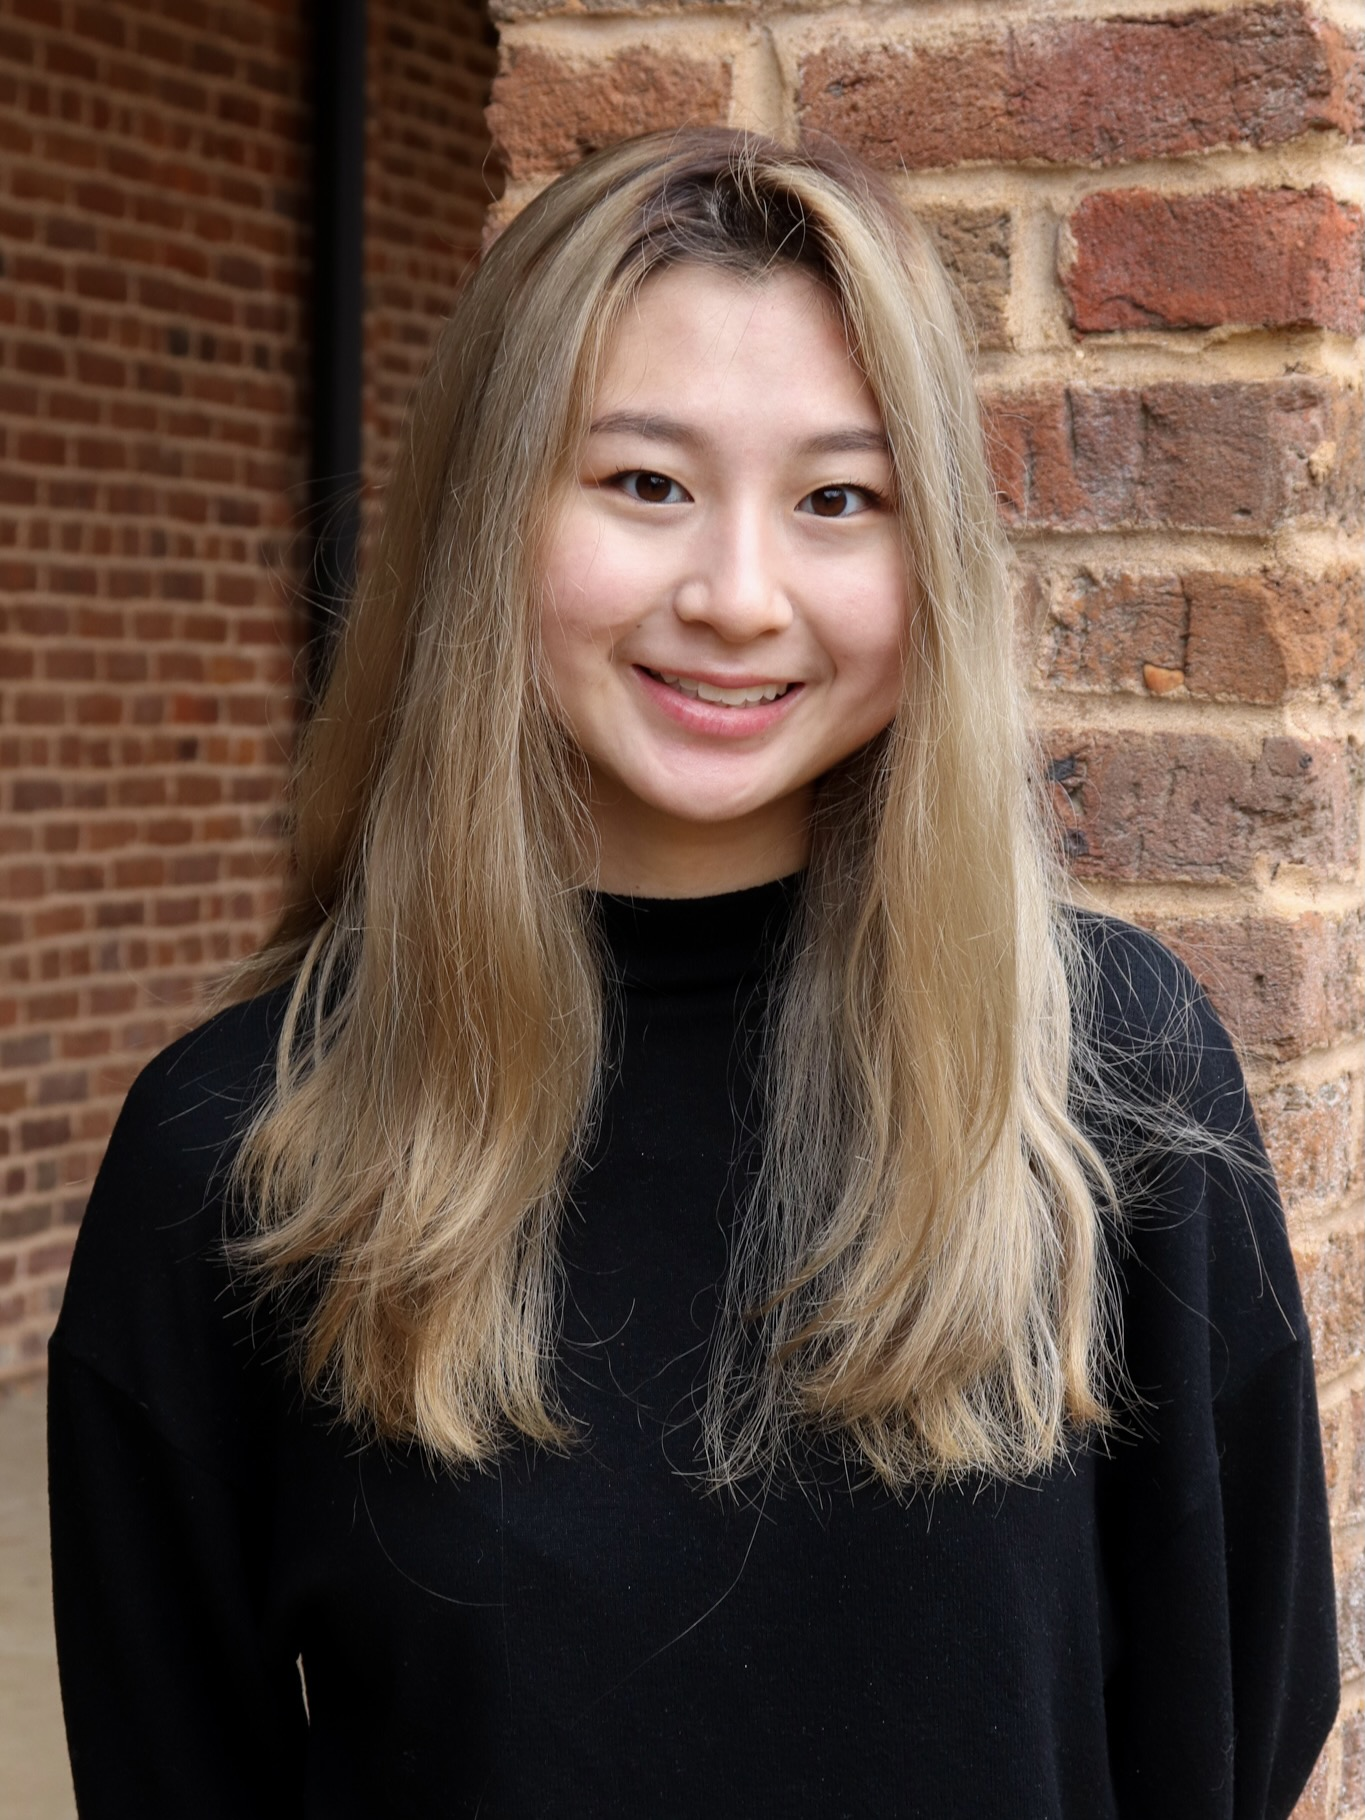 Samantha Moon